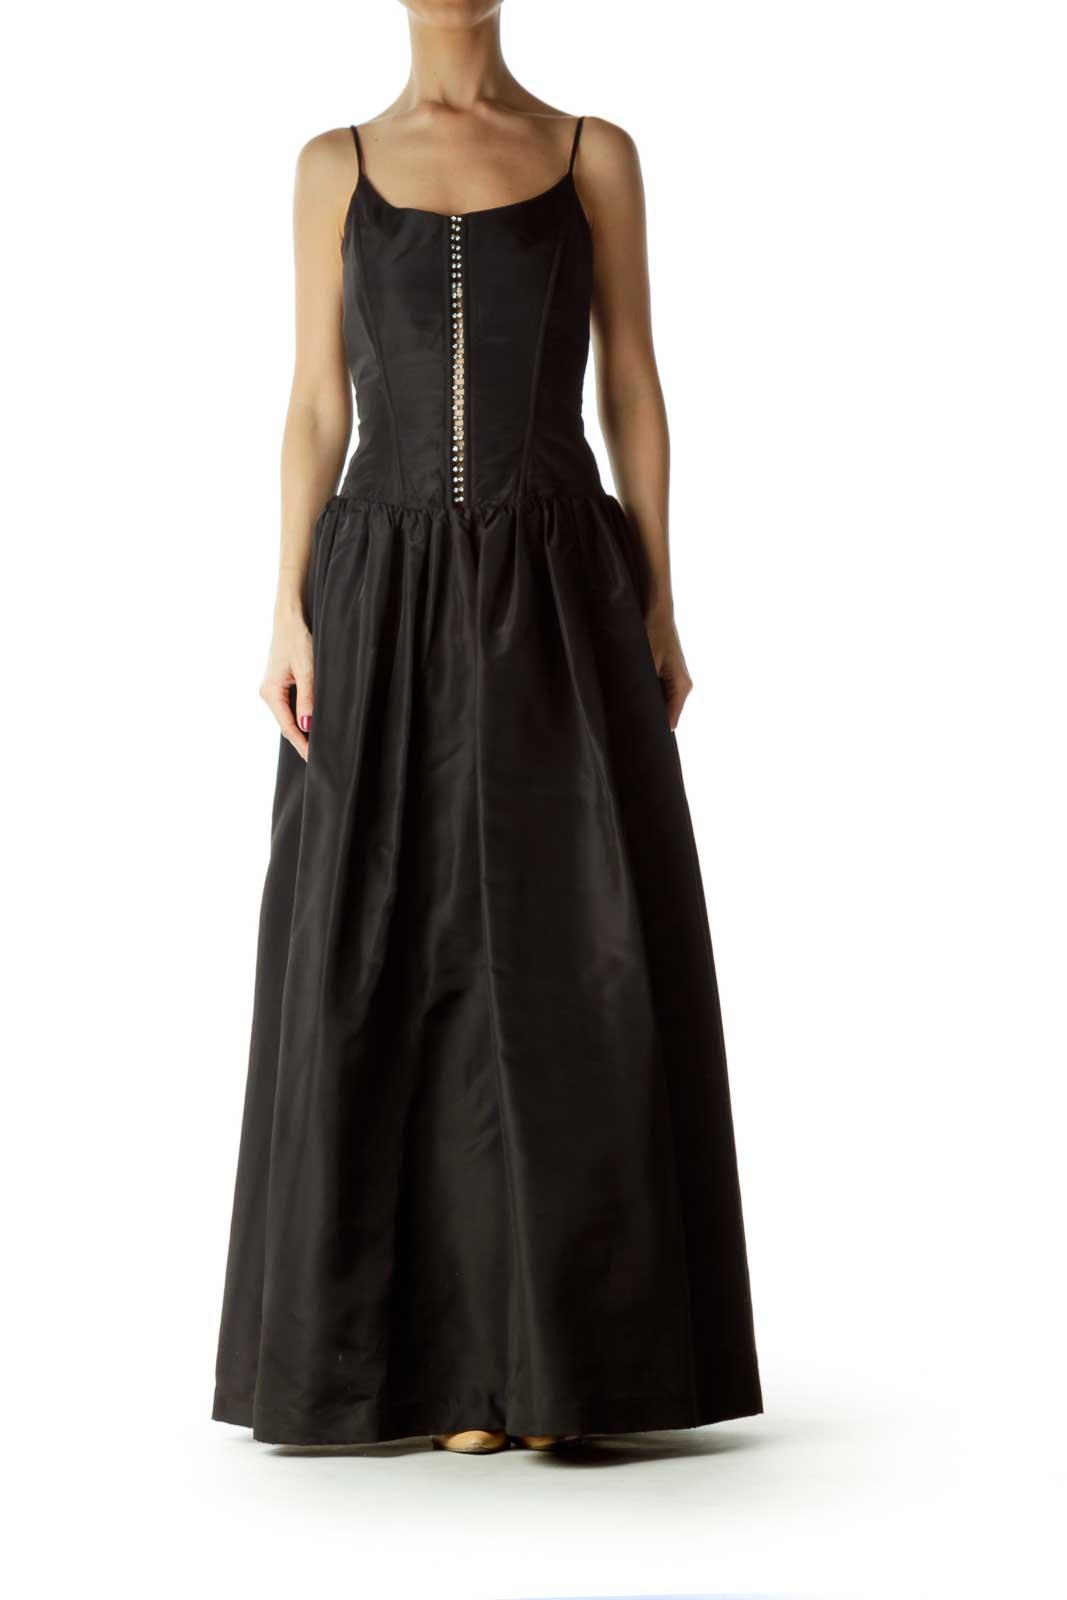 Black Spaghetti Strap Ball Gown Front